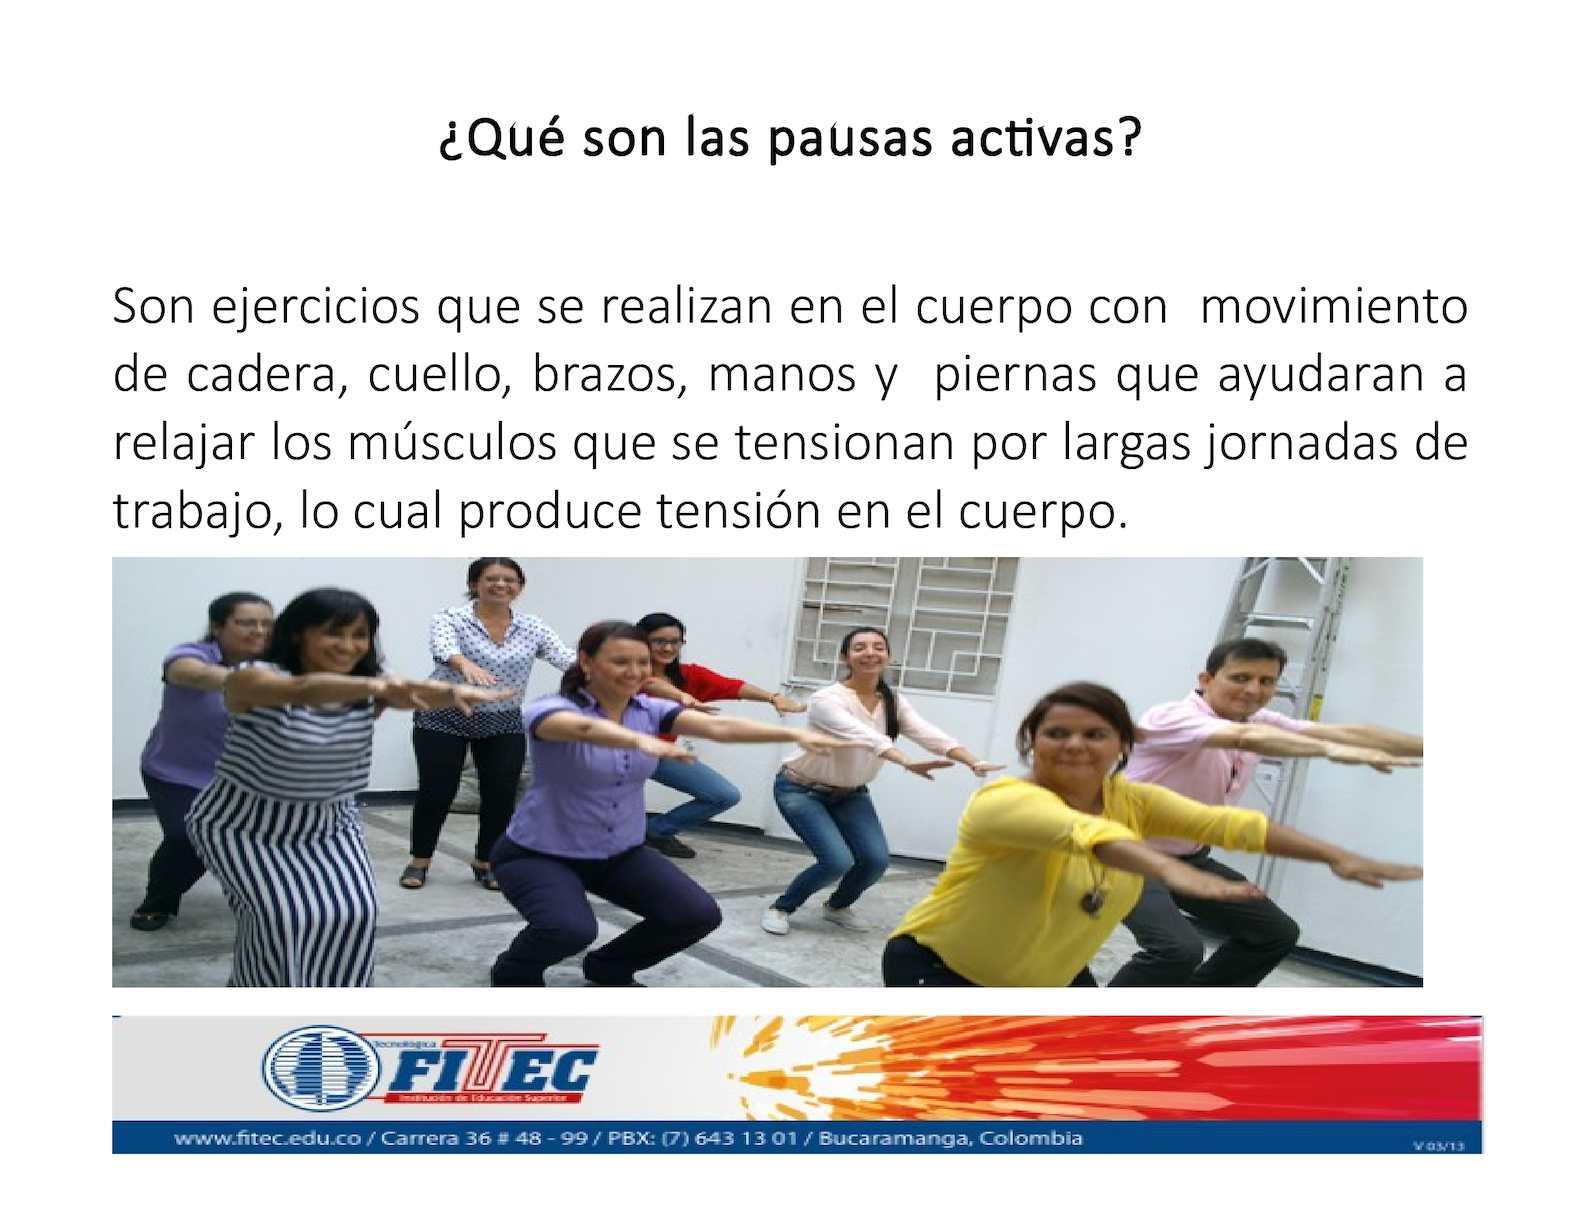 Calaméo - Presentacion Pausas Activas 7b3313a7b7f0